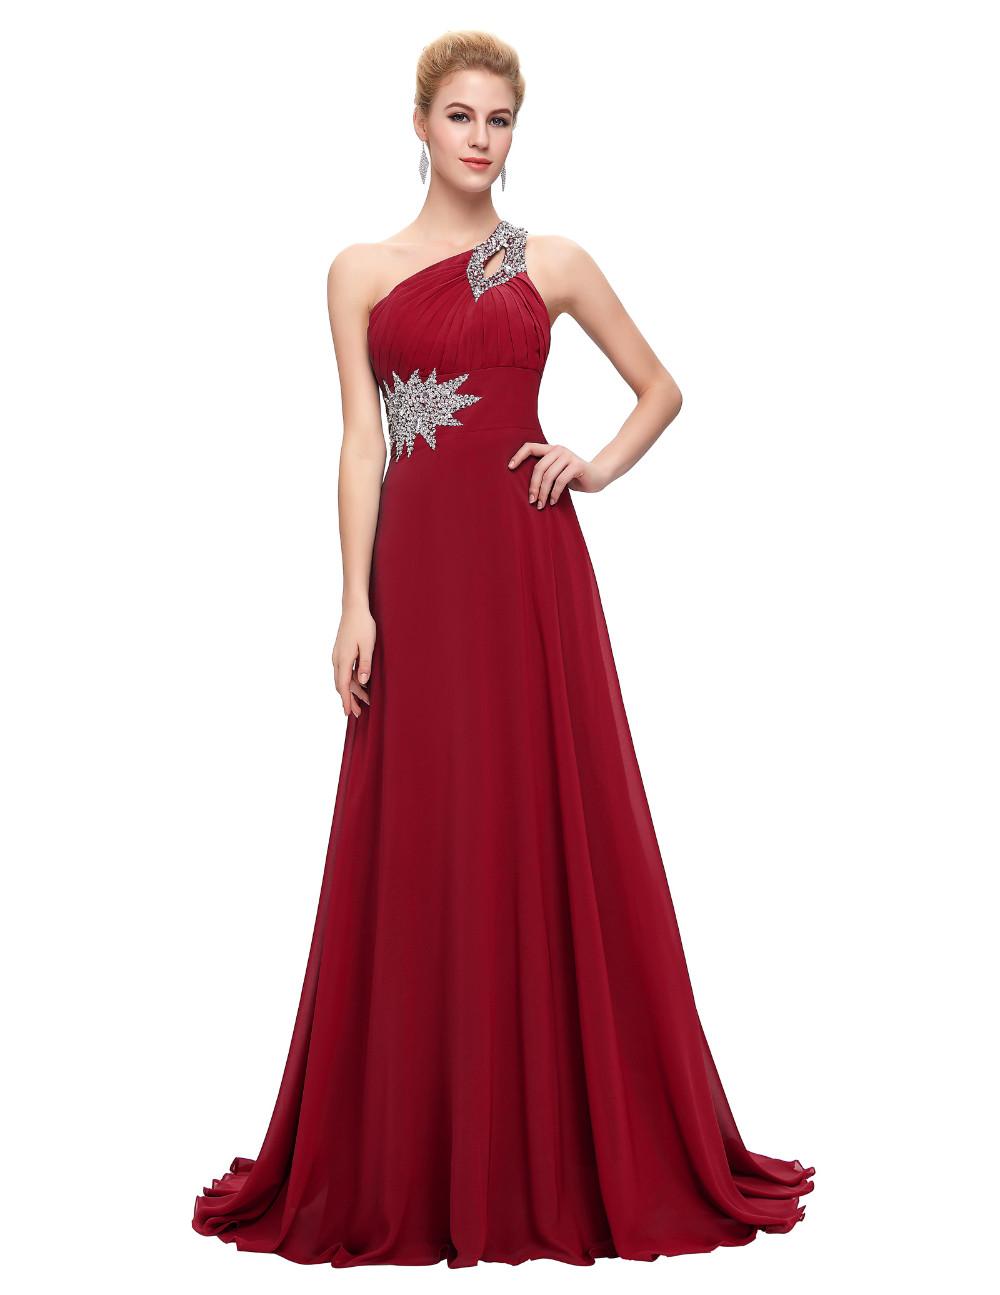 Elegant One Shoulder Long Bridesmaid Dress 13